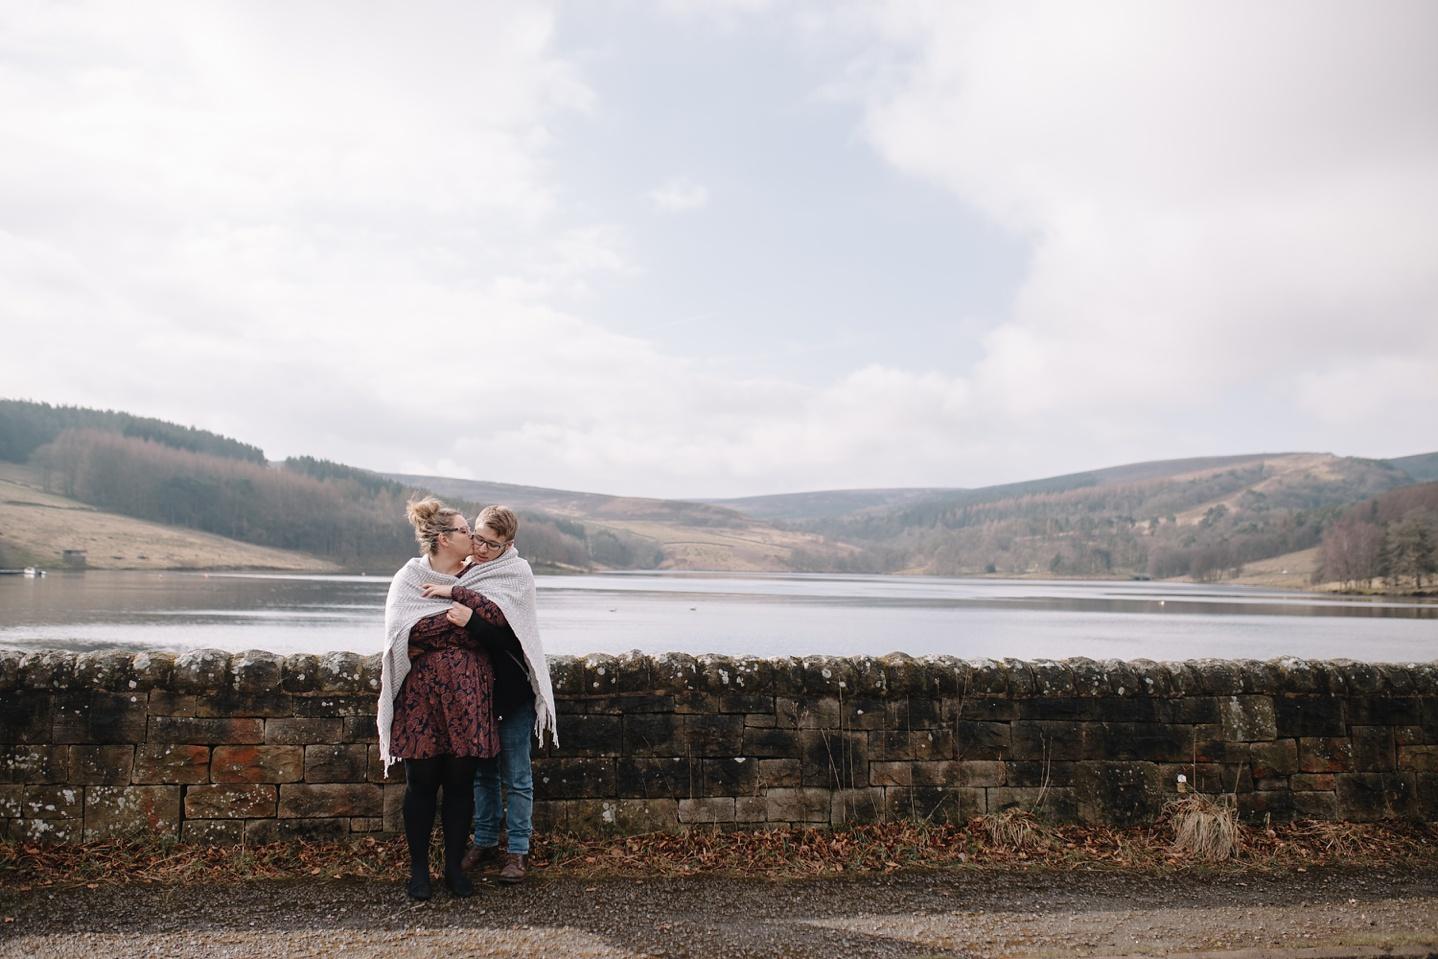 man and woman stood overlooking errwood reservoir